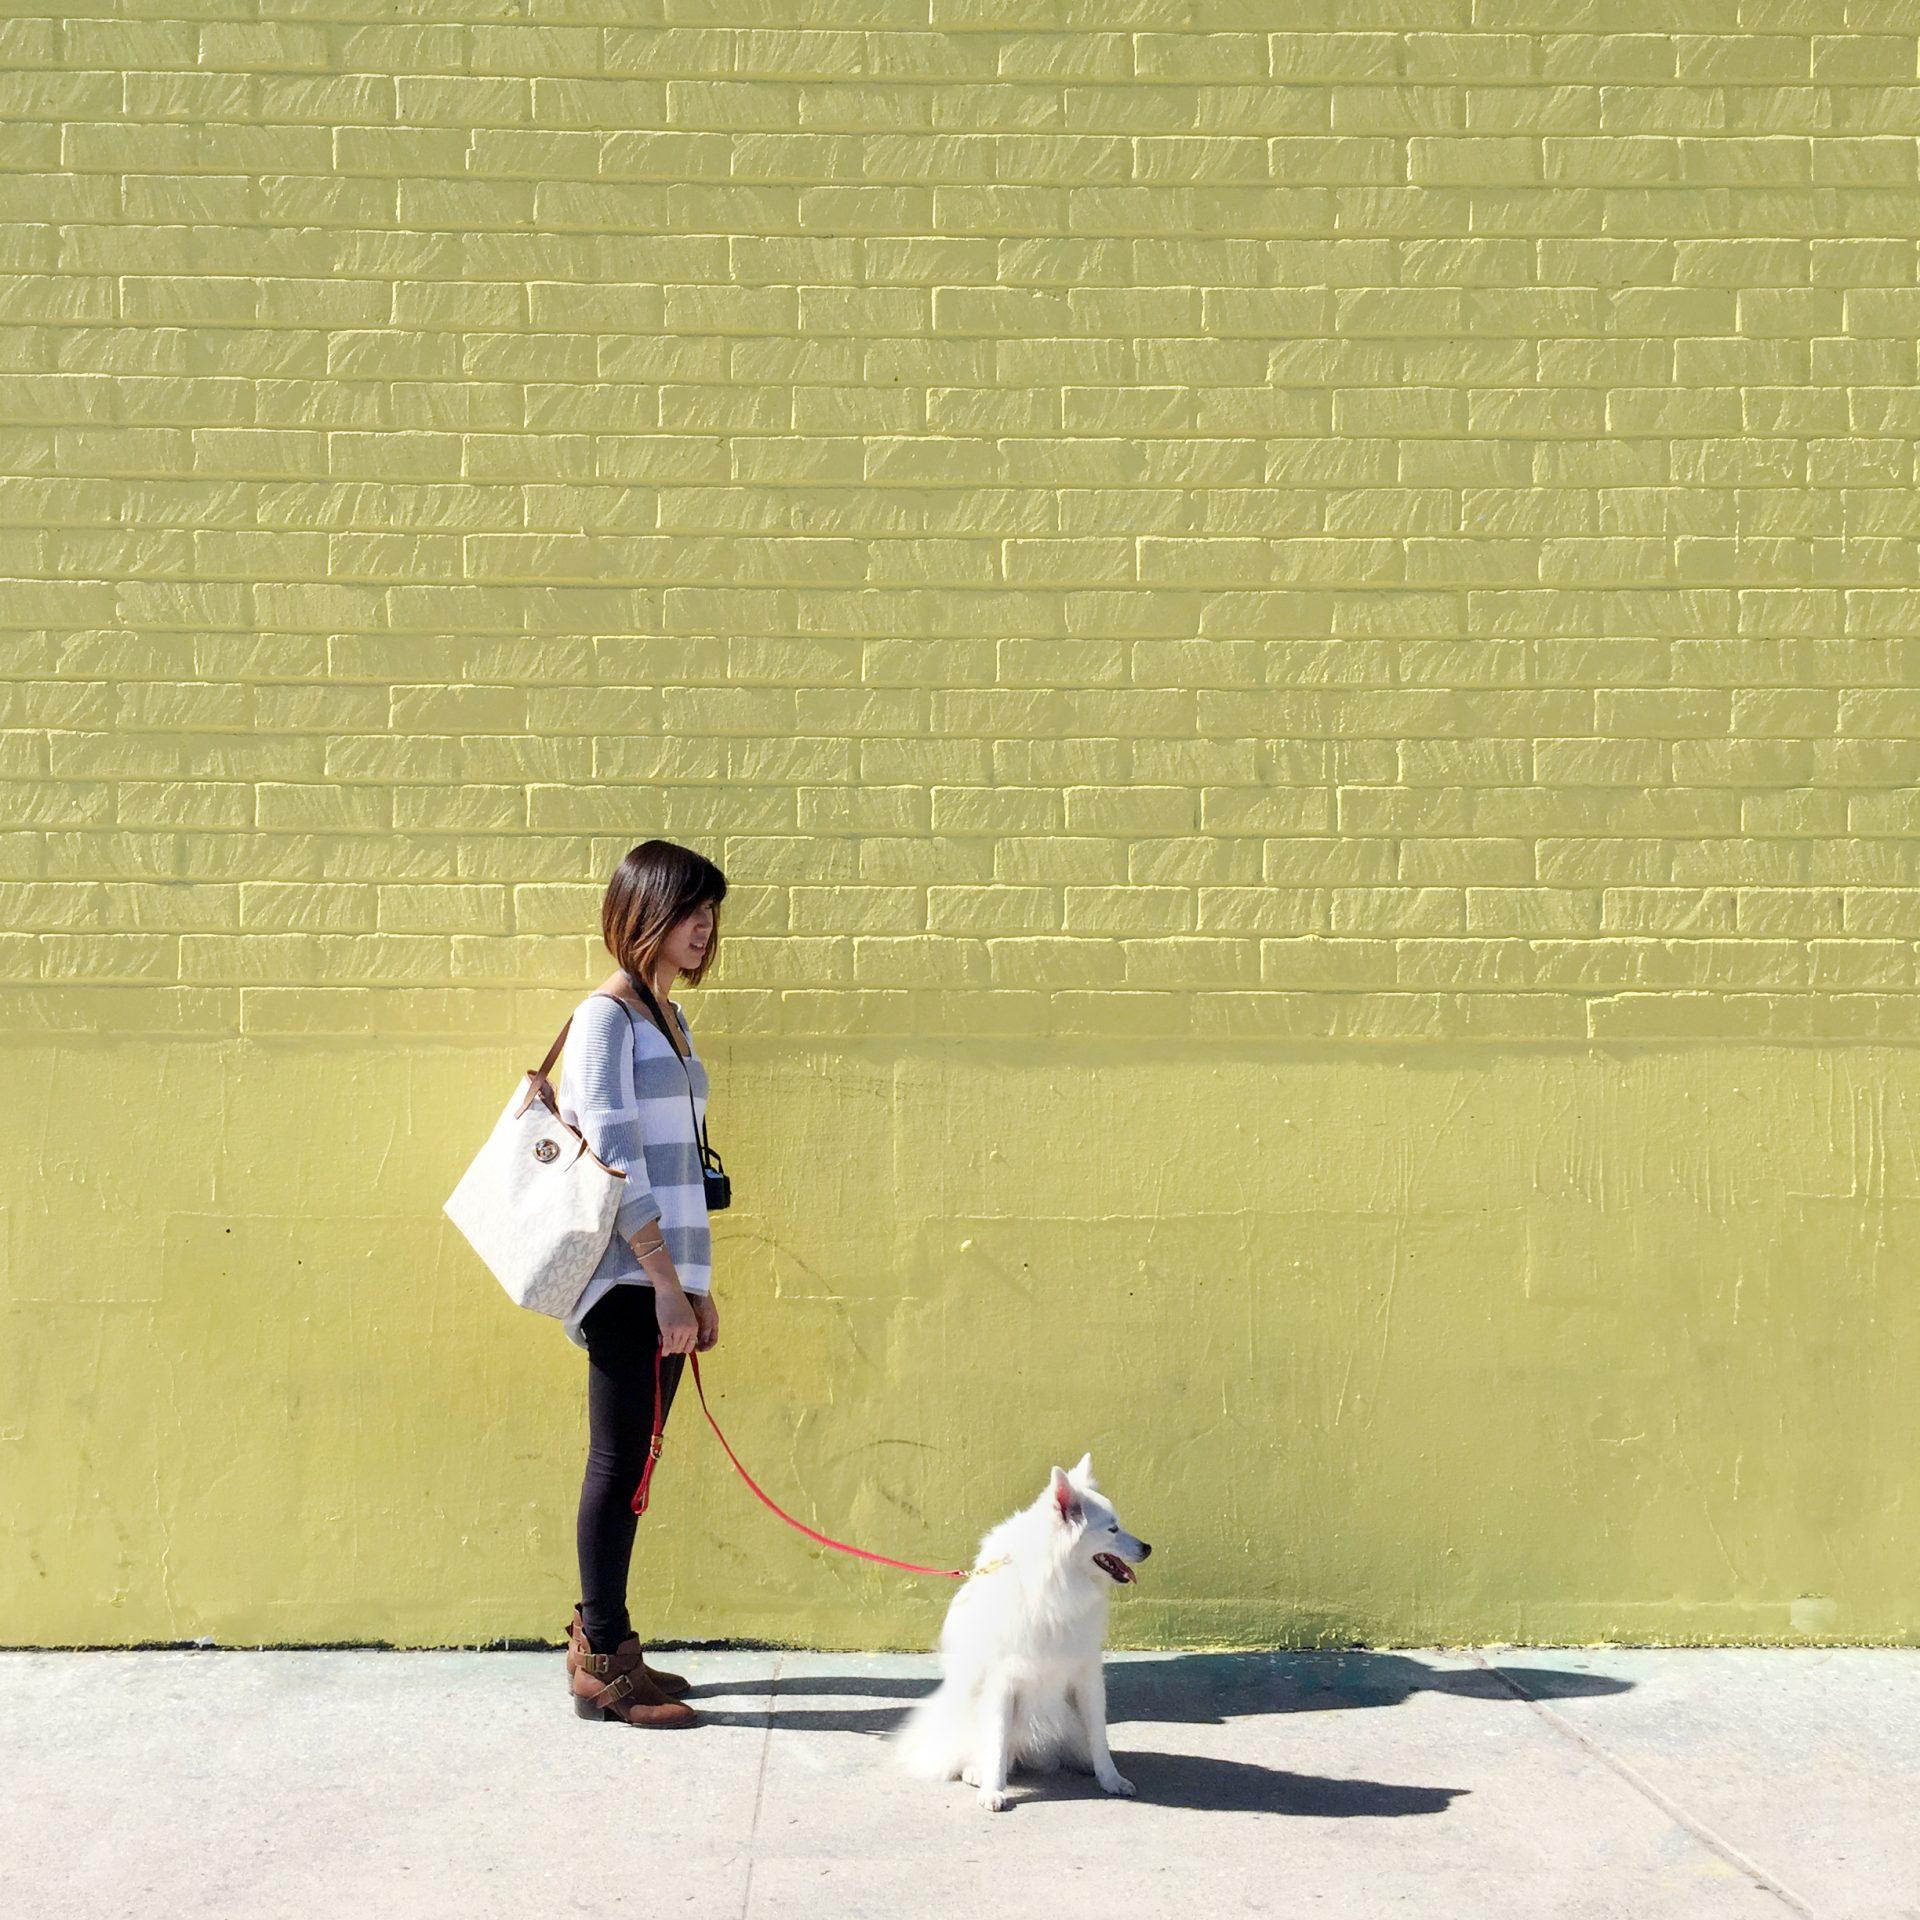 yellowwall